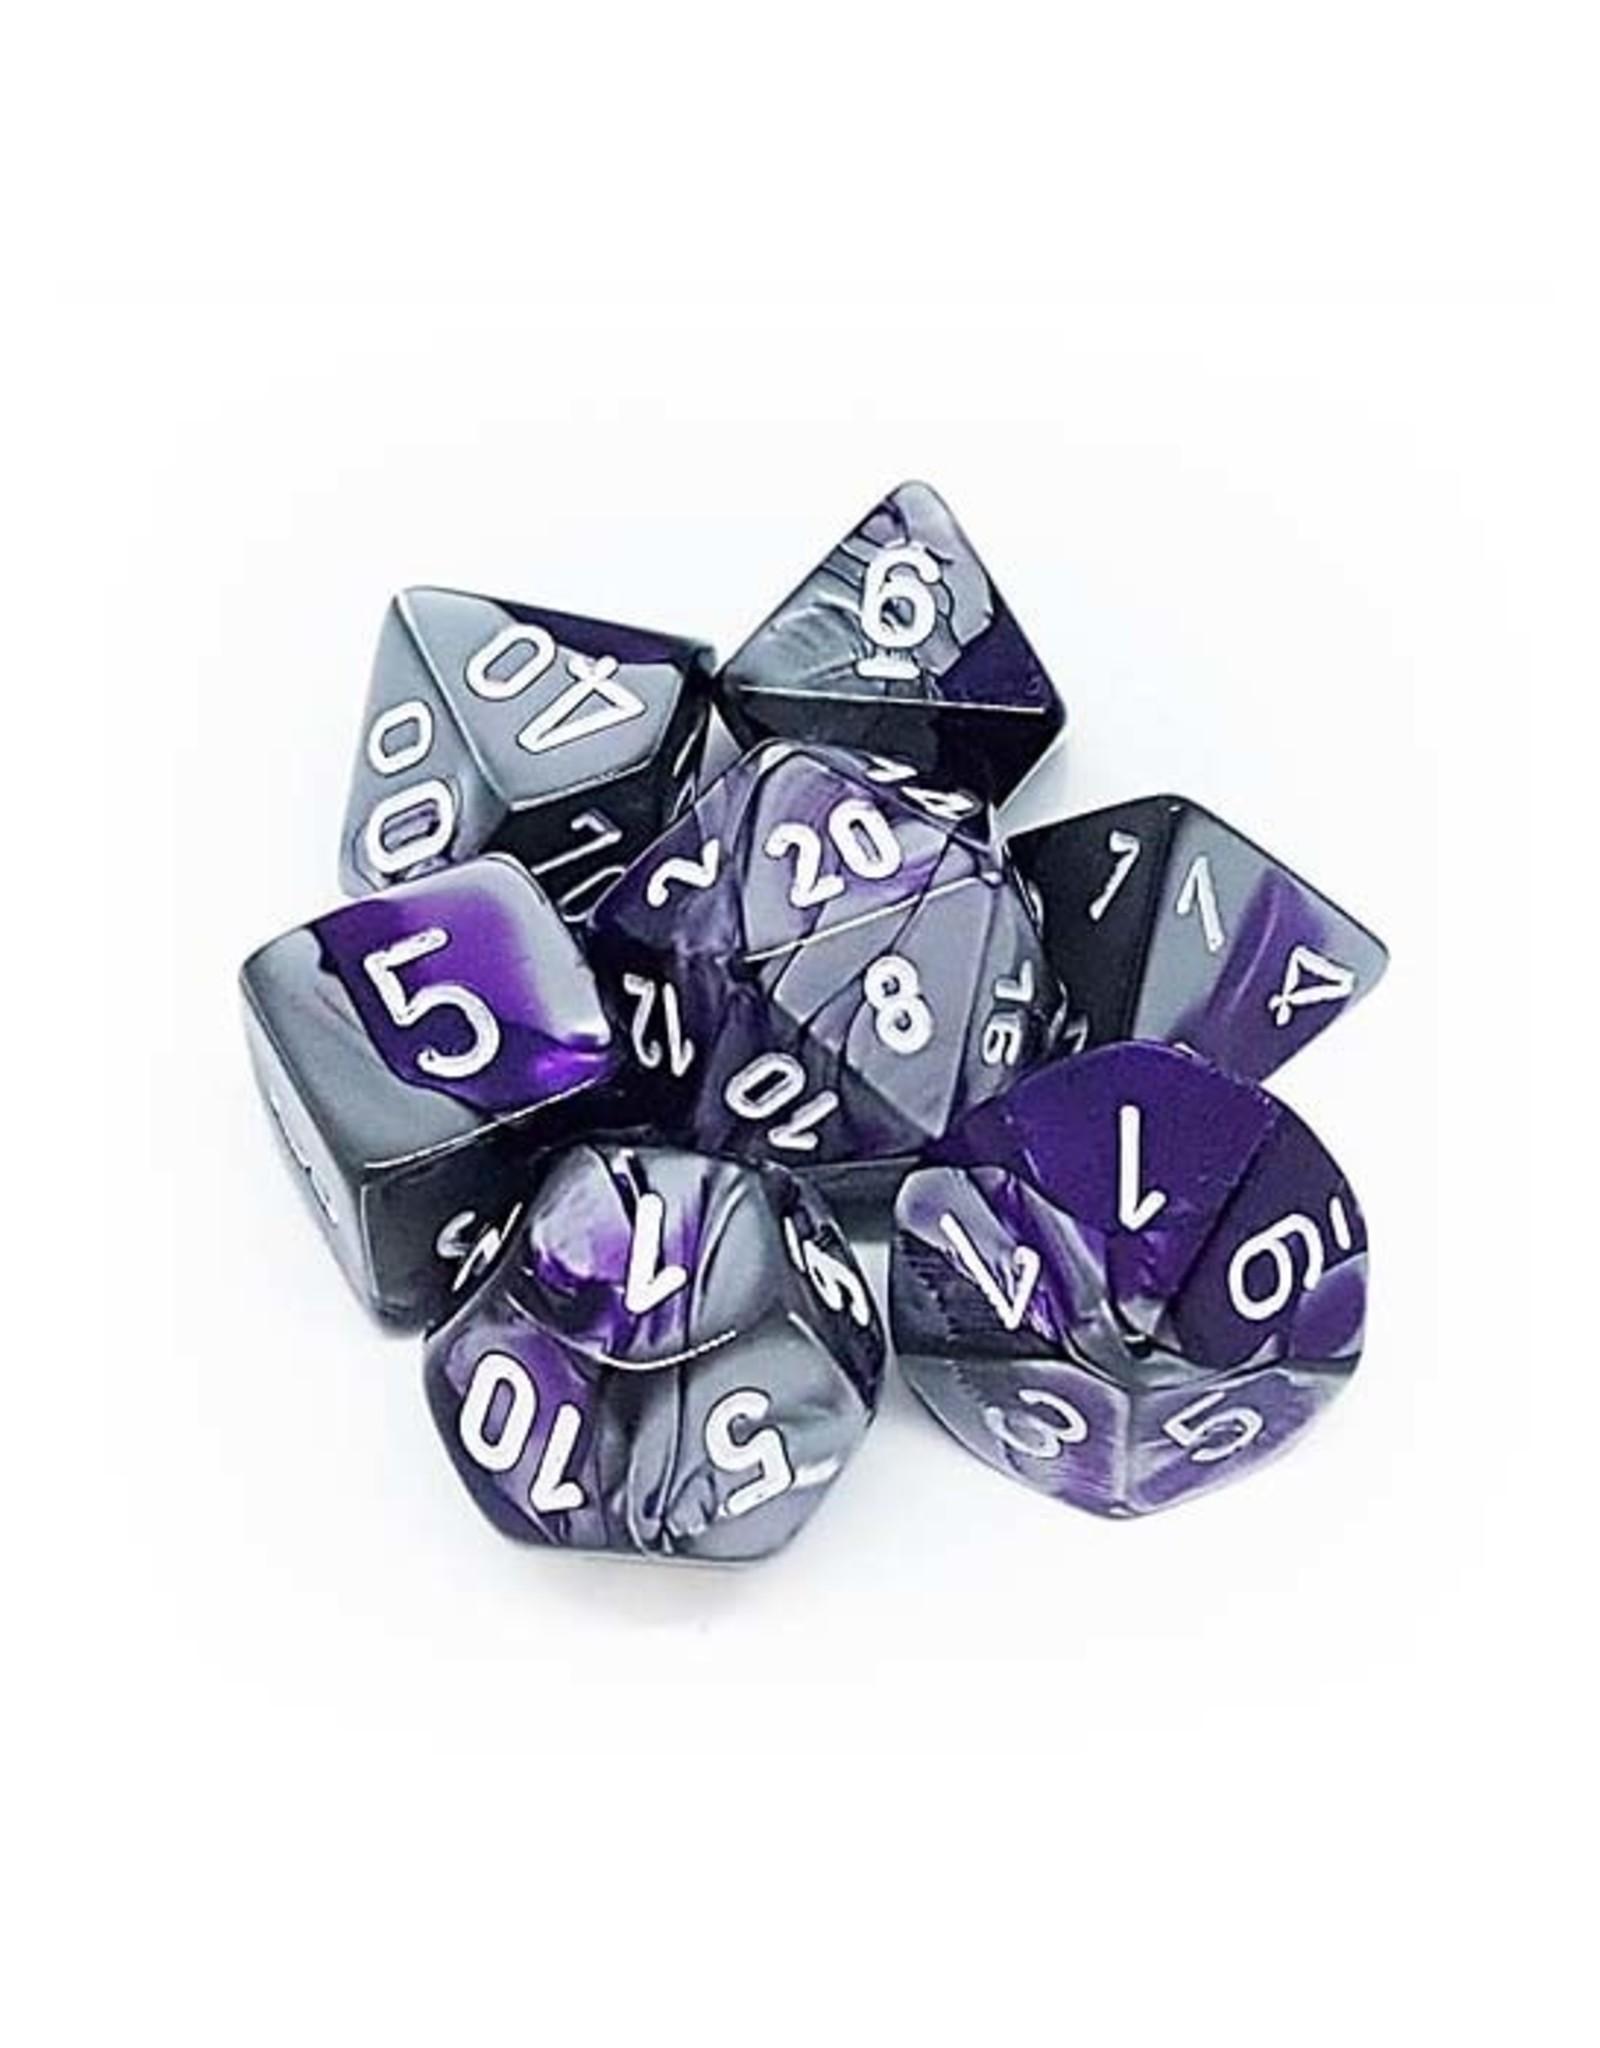 Chessex Chessex: Poly 7 Set - Gemini - Purple-Steel w/ White